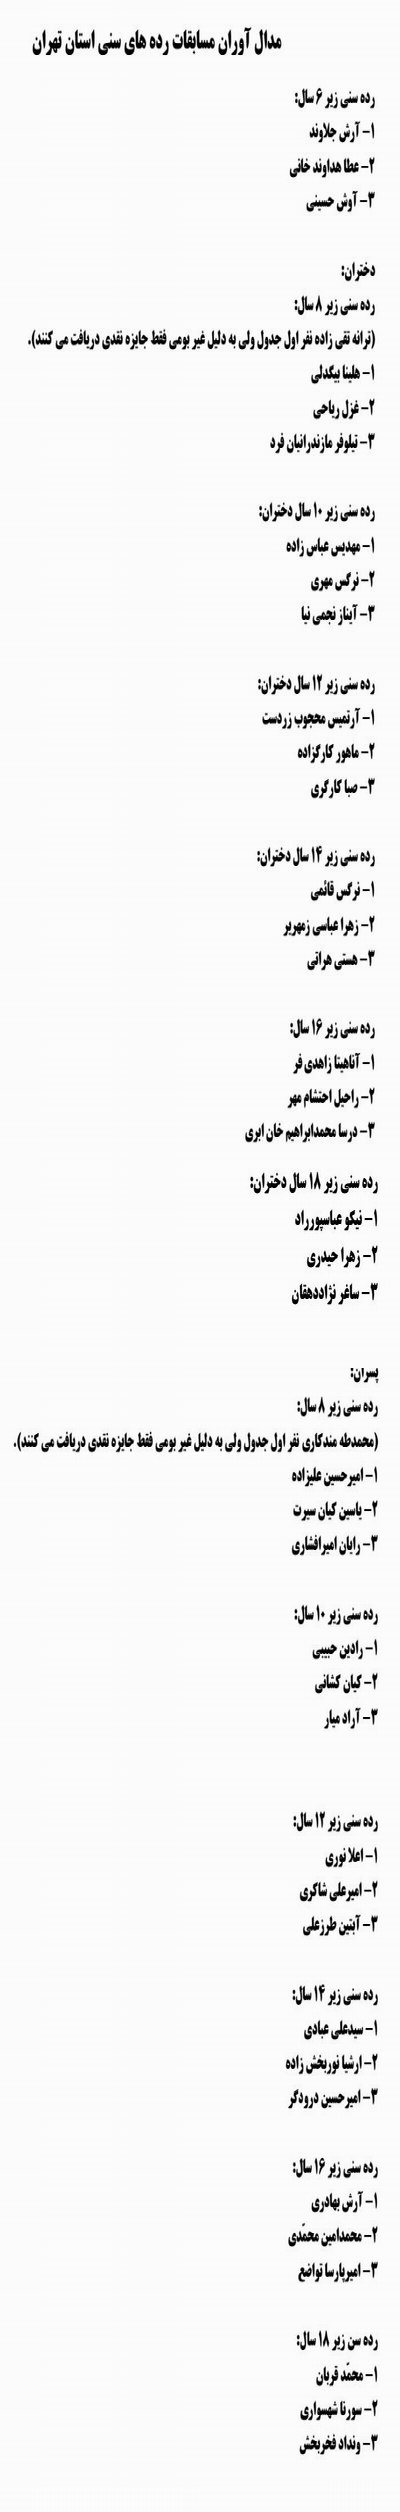 جدول مدال آوران تهران